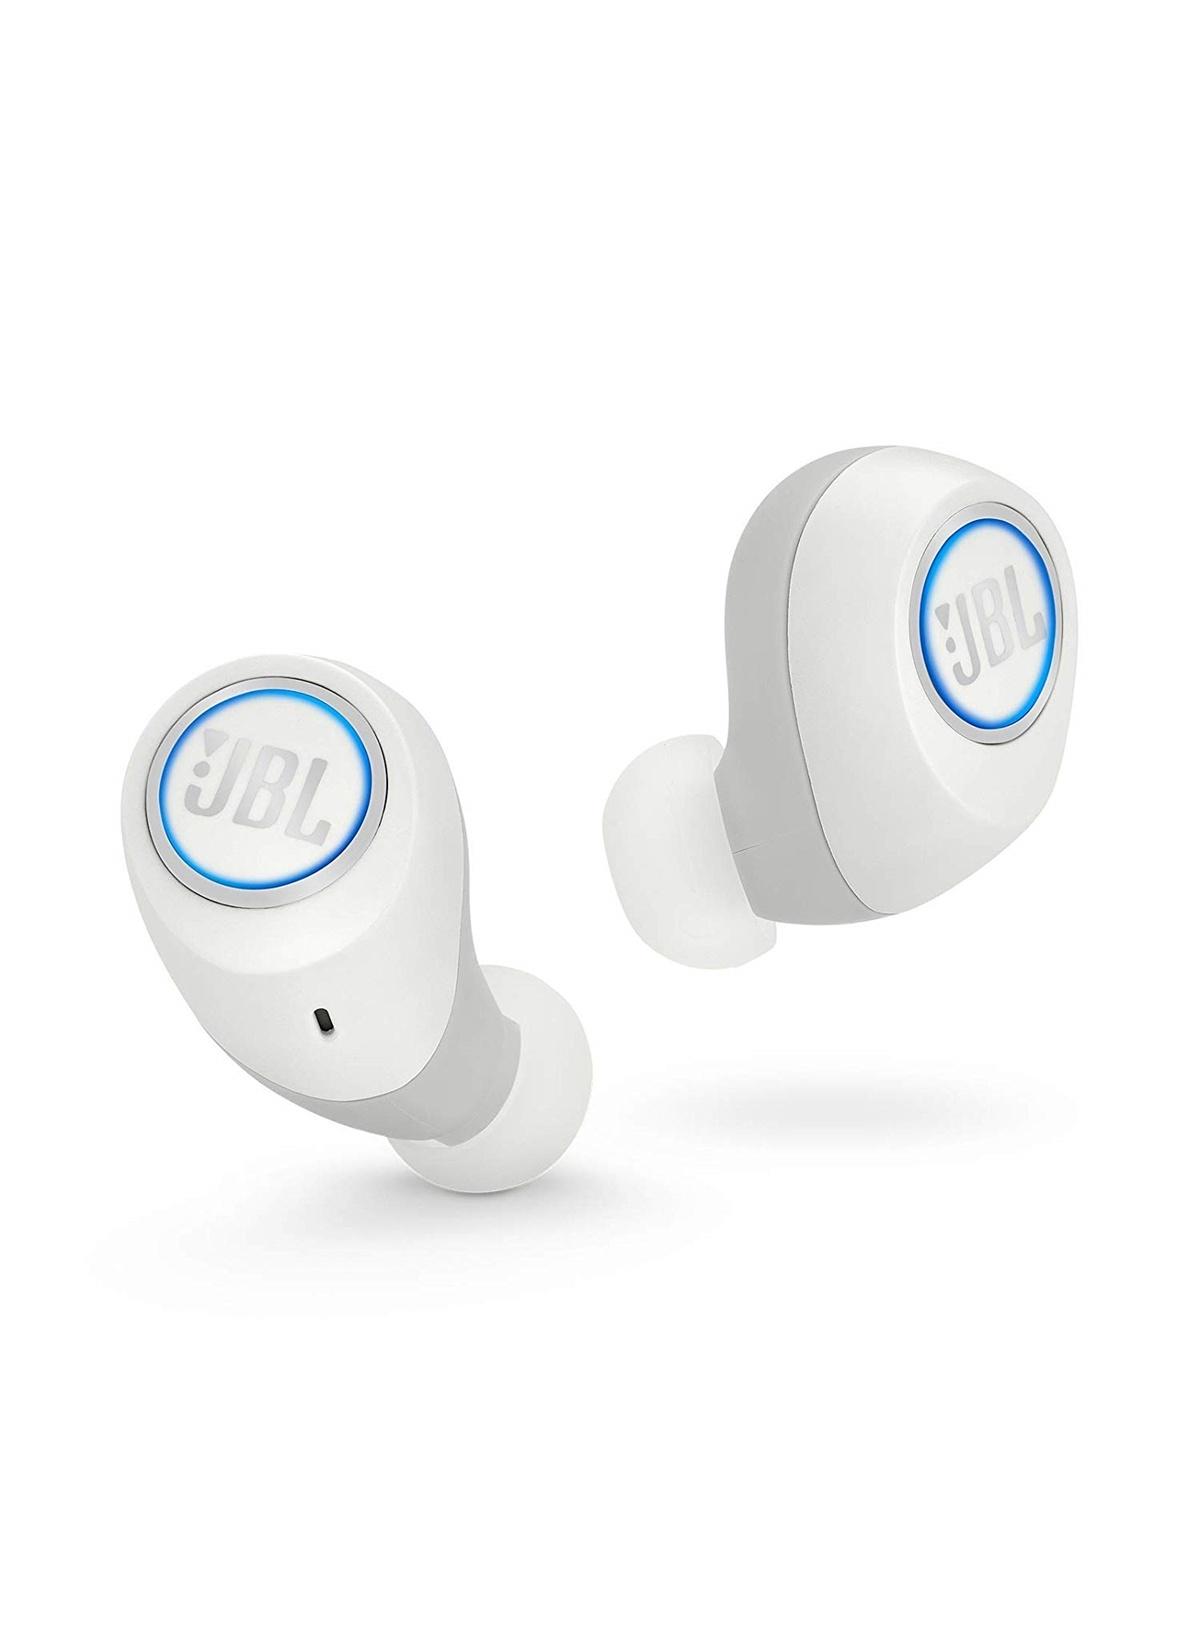 Standart JBL Free True Wireless Beyaz Bluetooth Stereo Kulak İçi Kulaklık